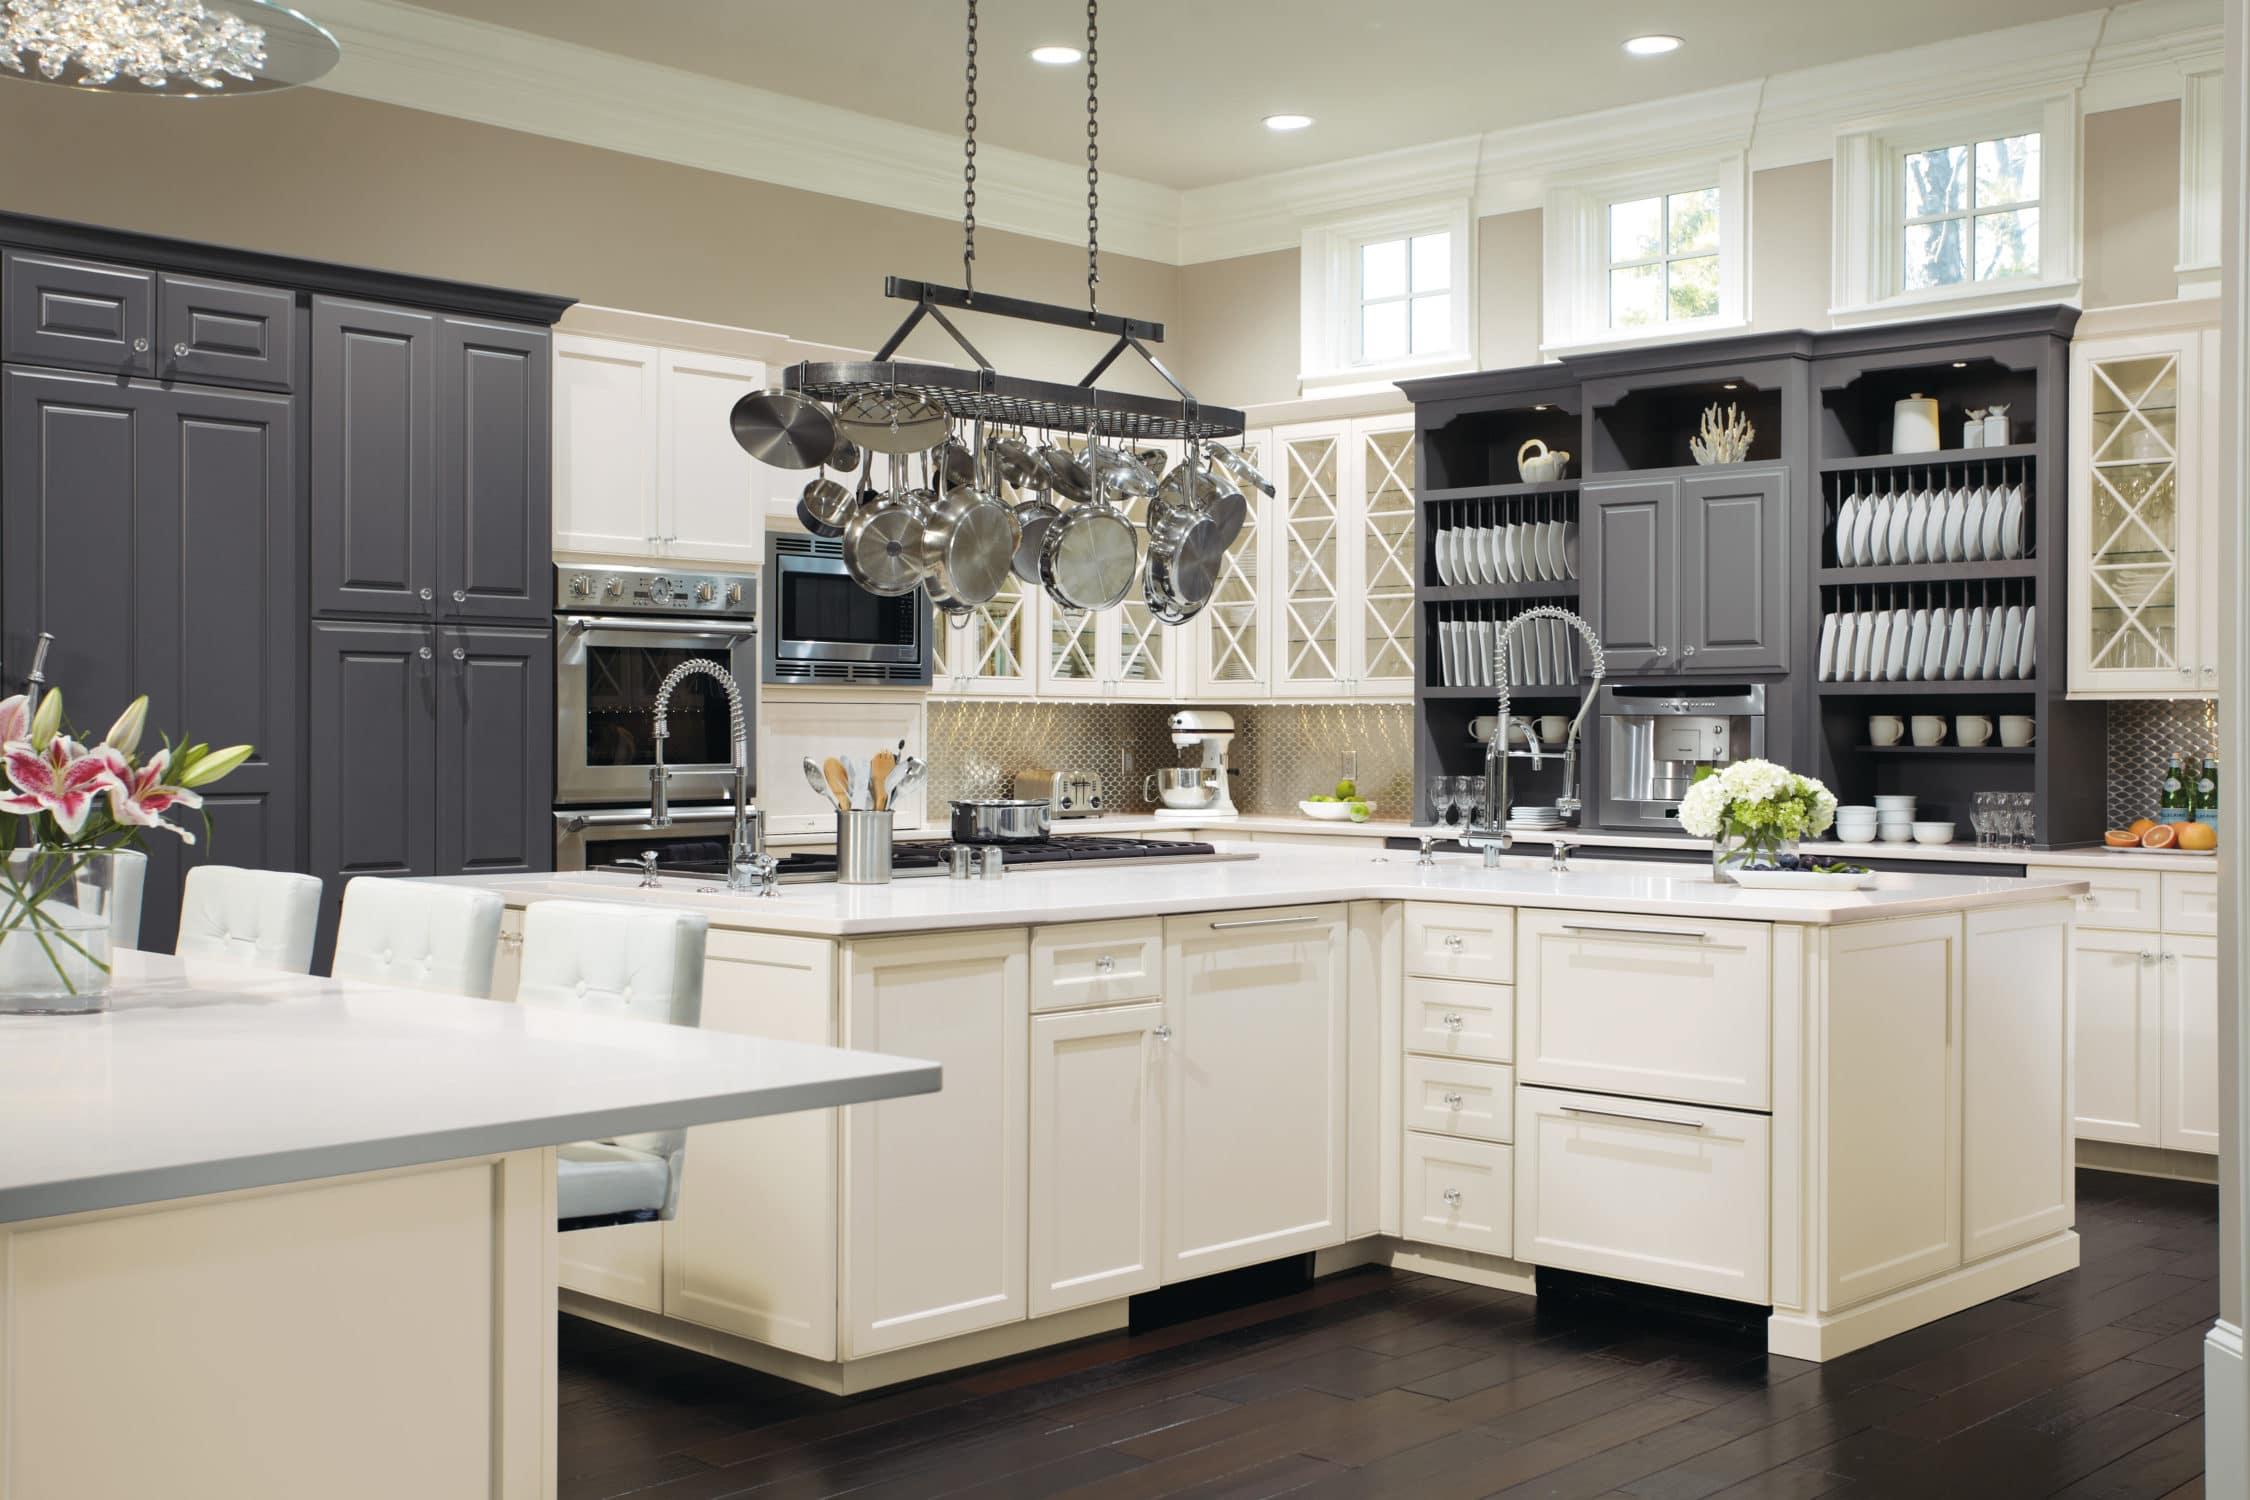 Kitchen Cabinets Design Trade Mark